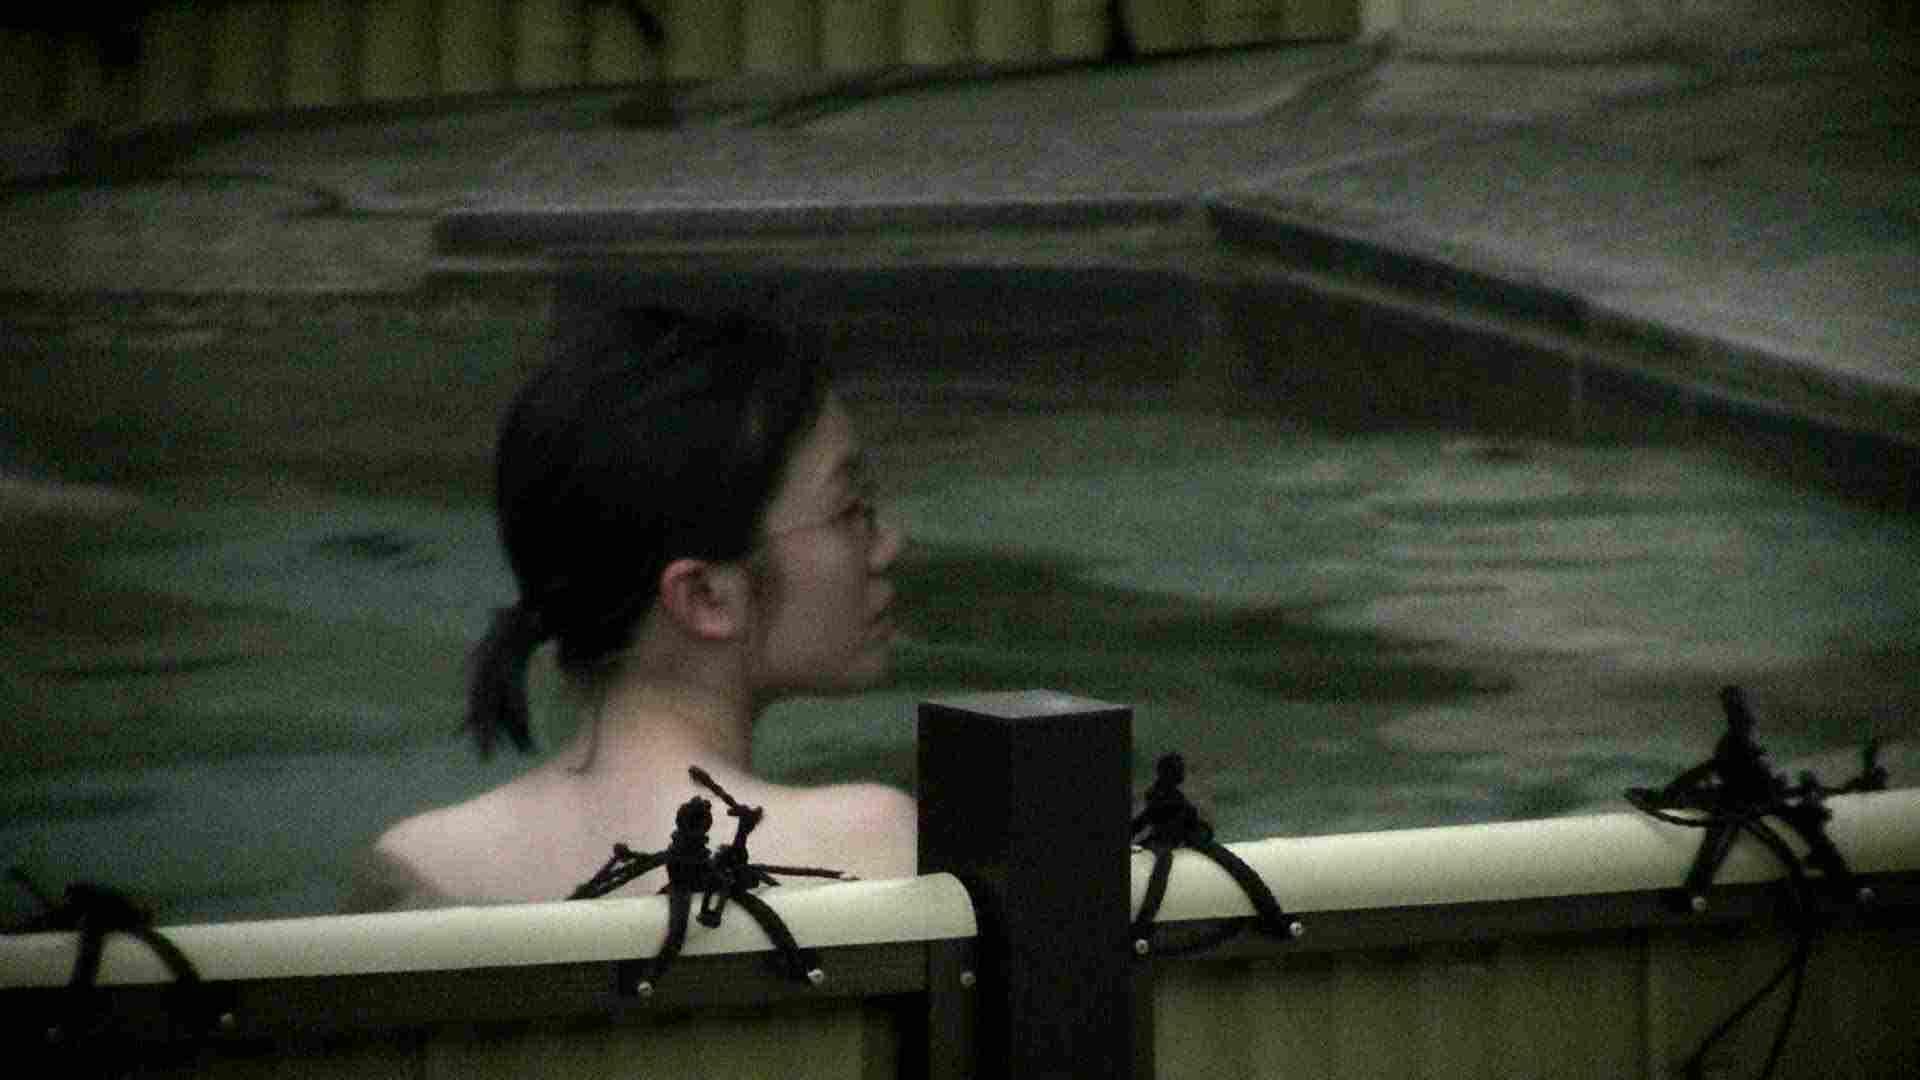 Aquaな露天風呂Vol.684 OLのエロ生活   露天風呂  59連発 49